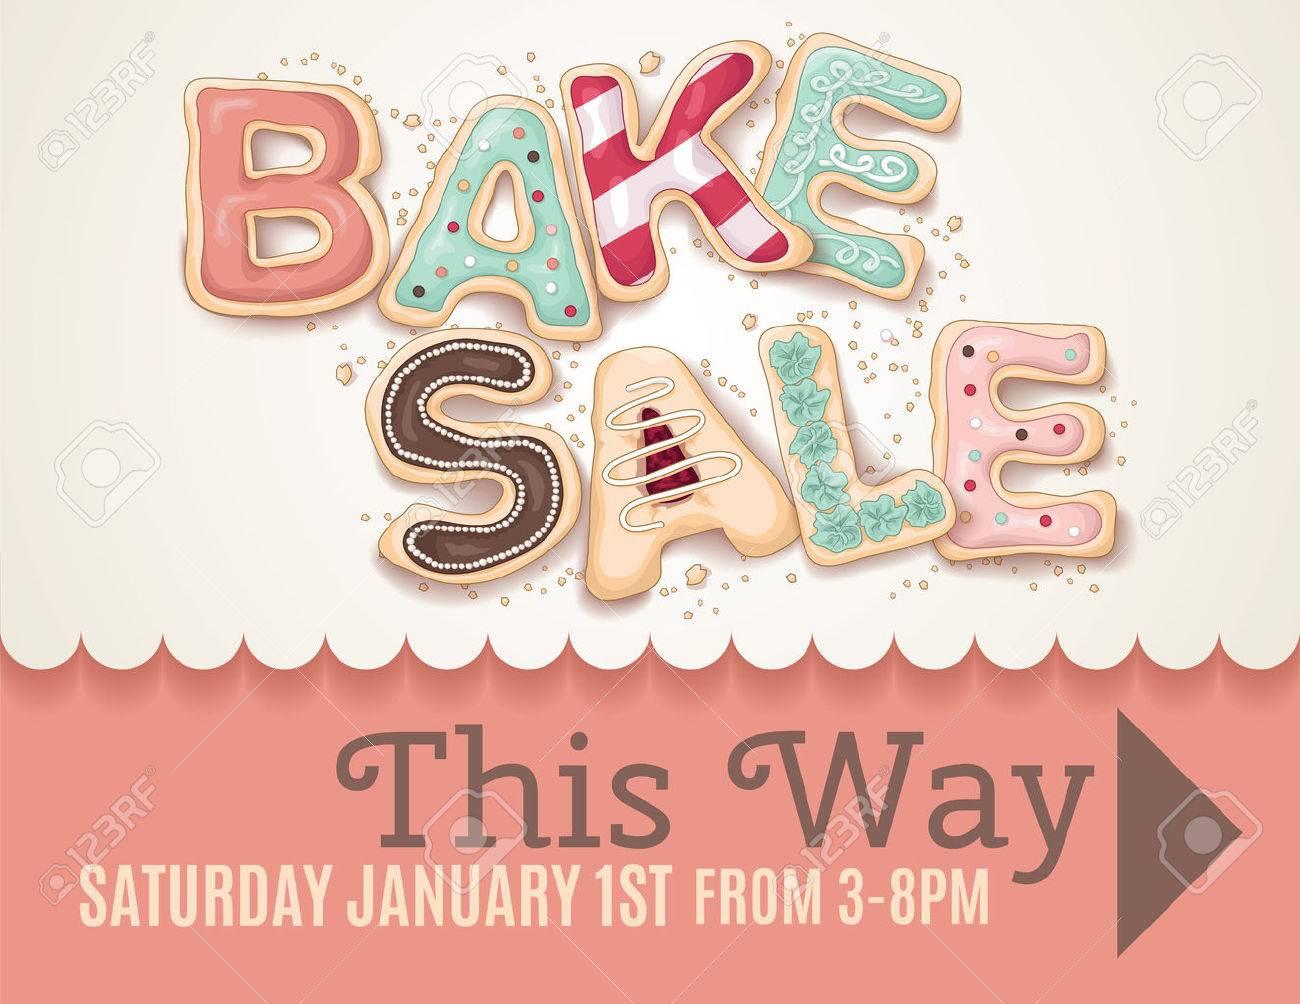 bake sale flyer templates free